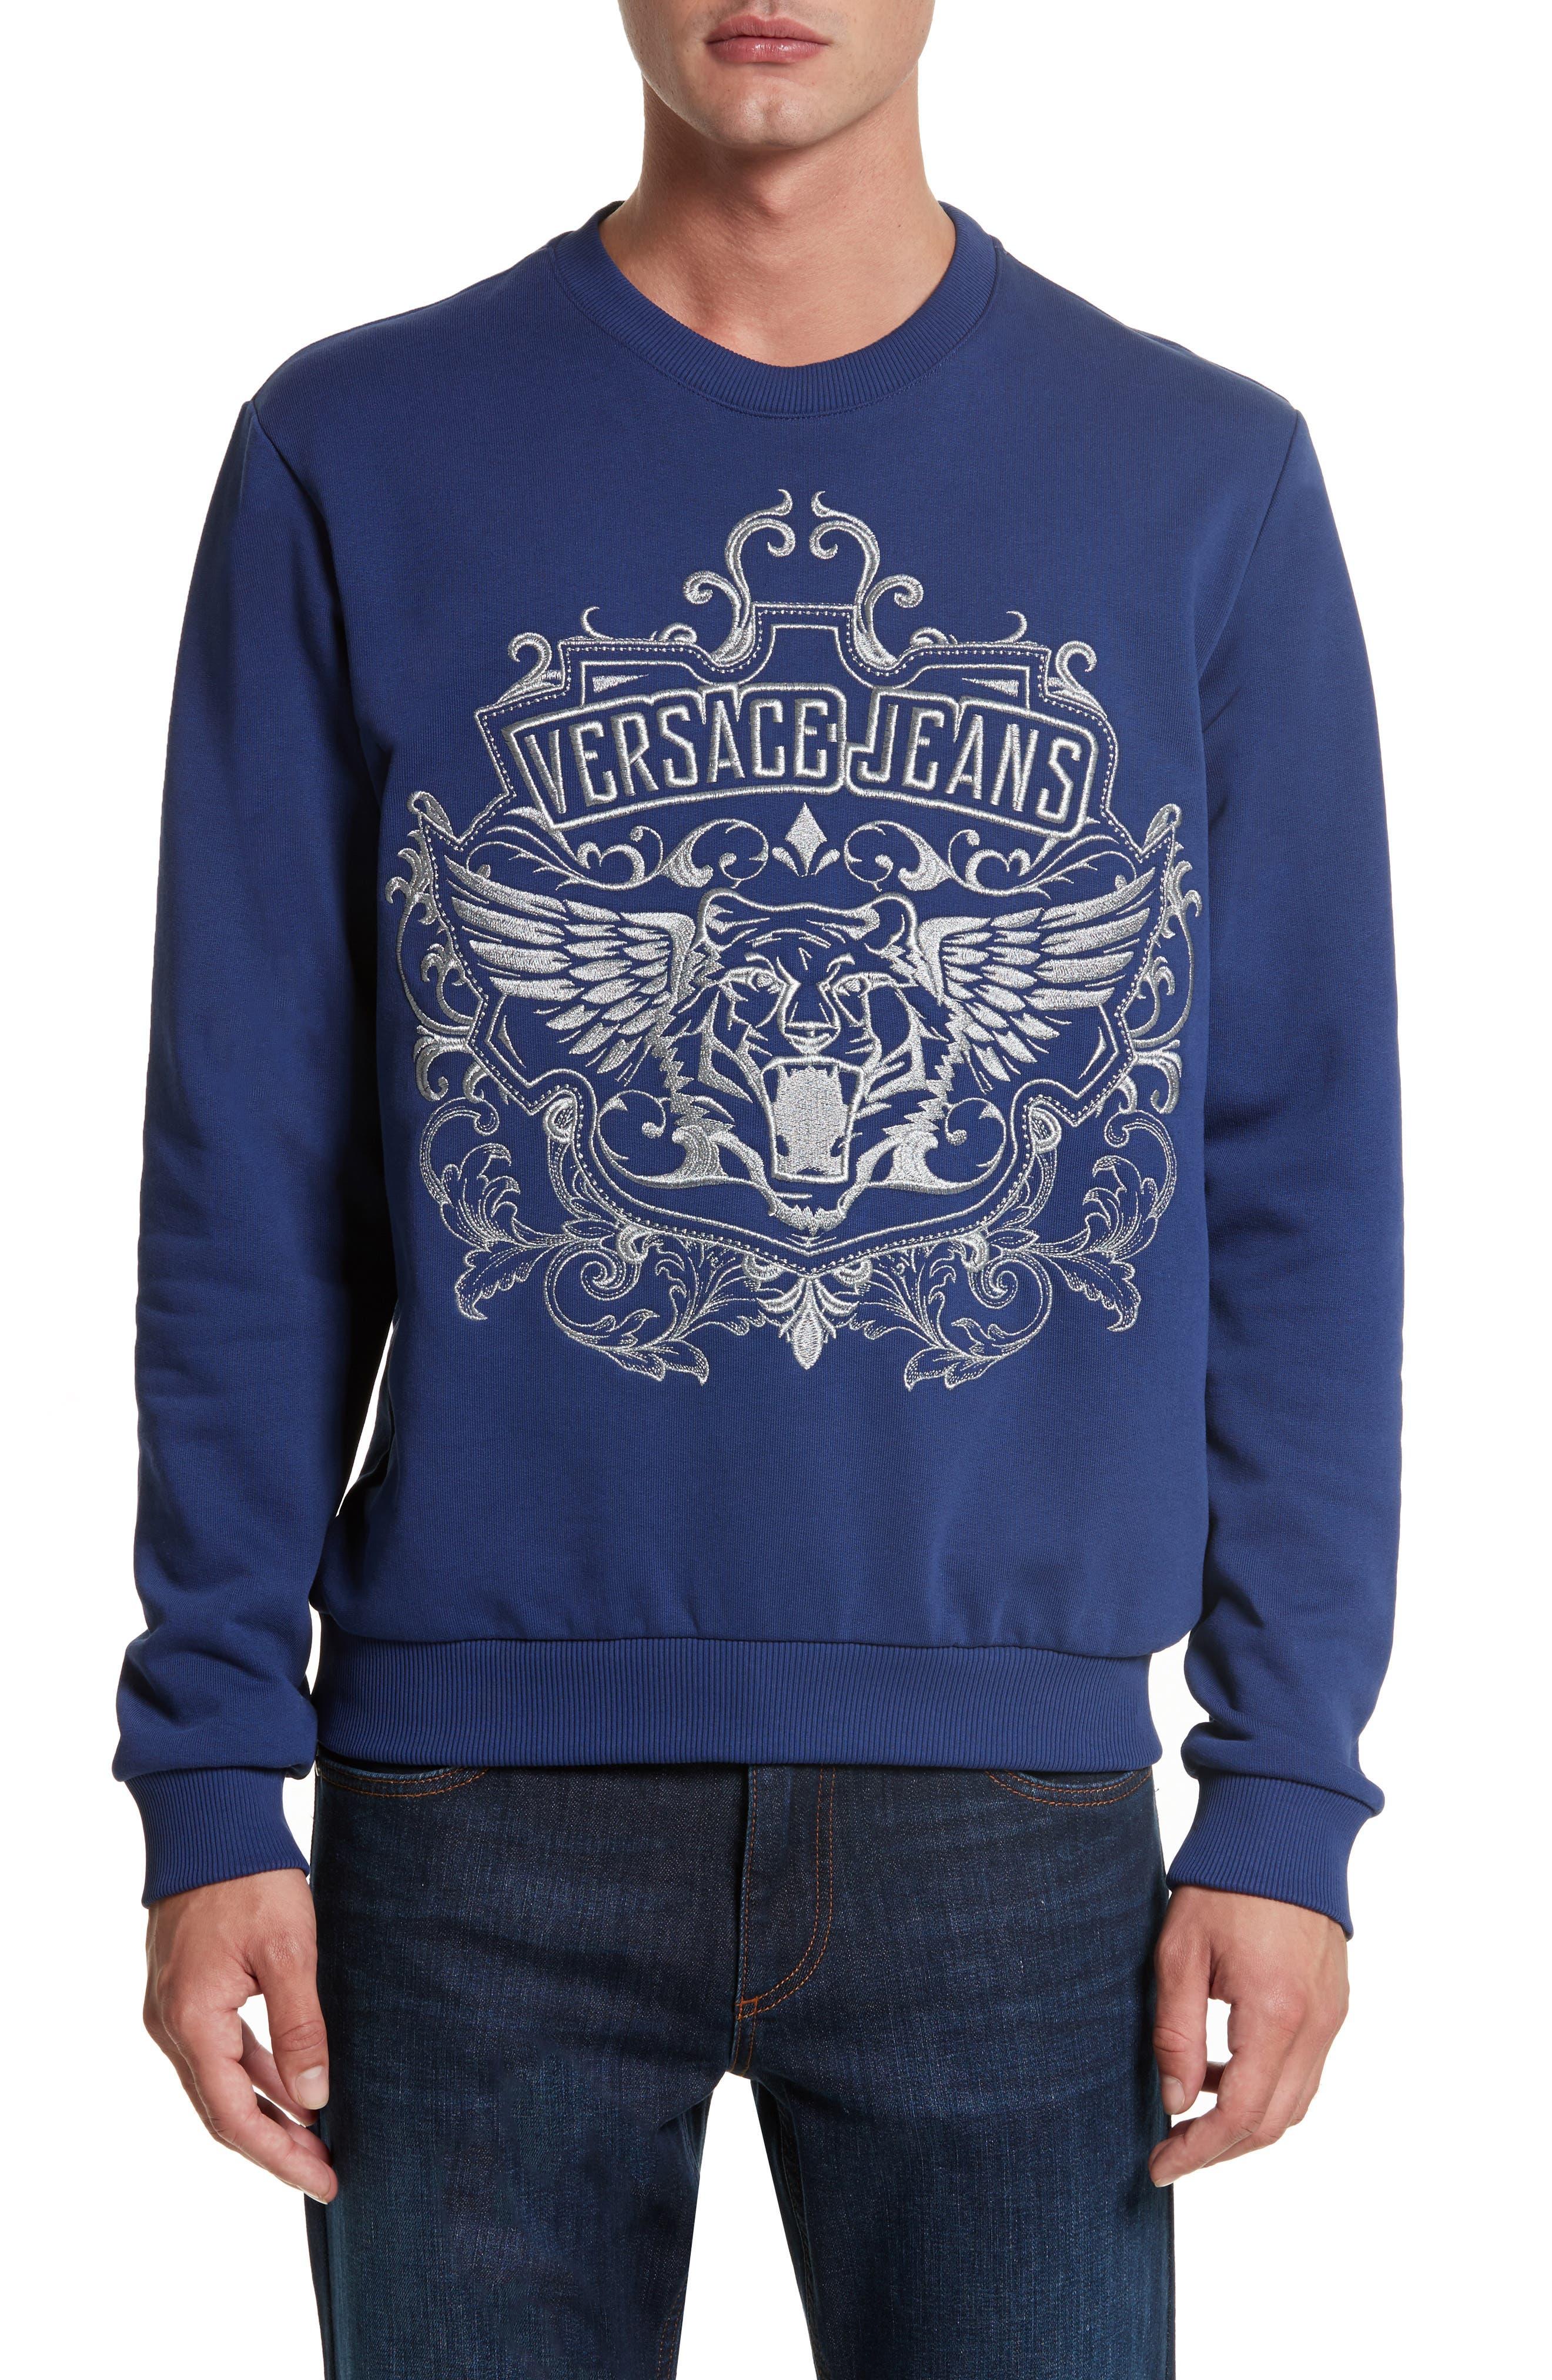 Alternate Image 1 Selected - Versace Jeans Embroidered Crewneck Sweatshirt